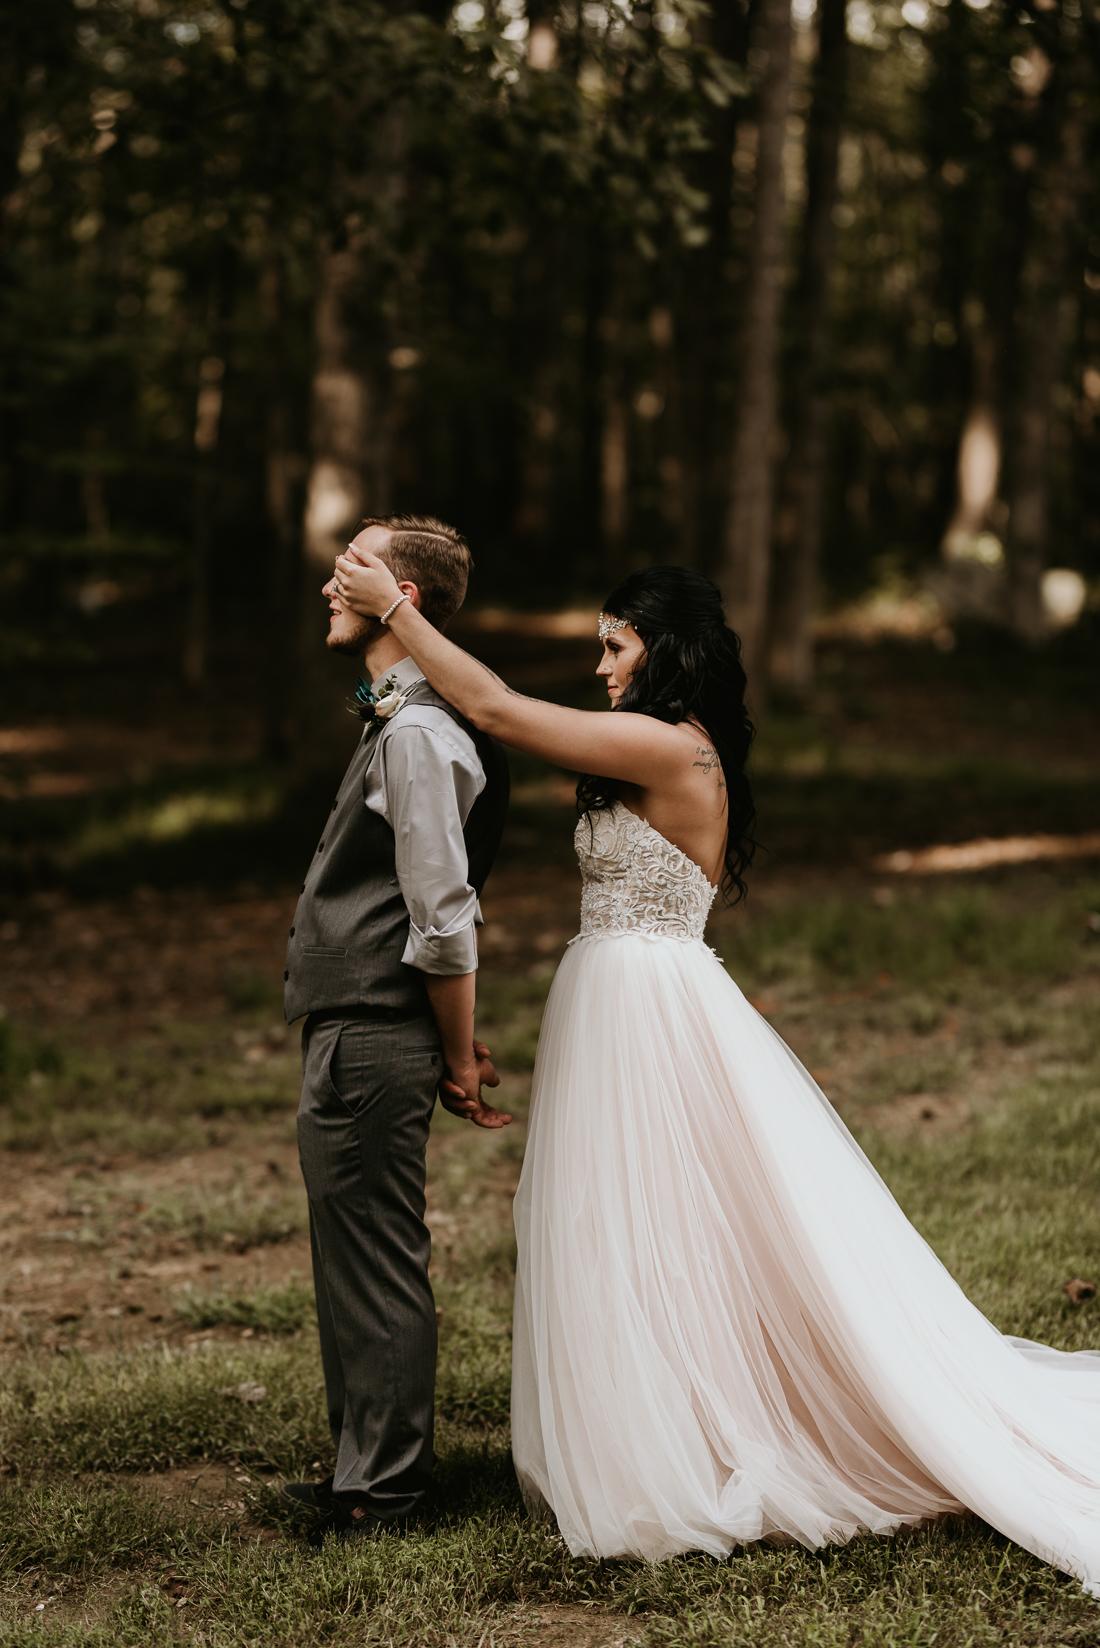 olivia_zay_wedding_09_2018-7502.jpg